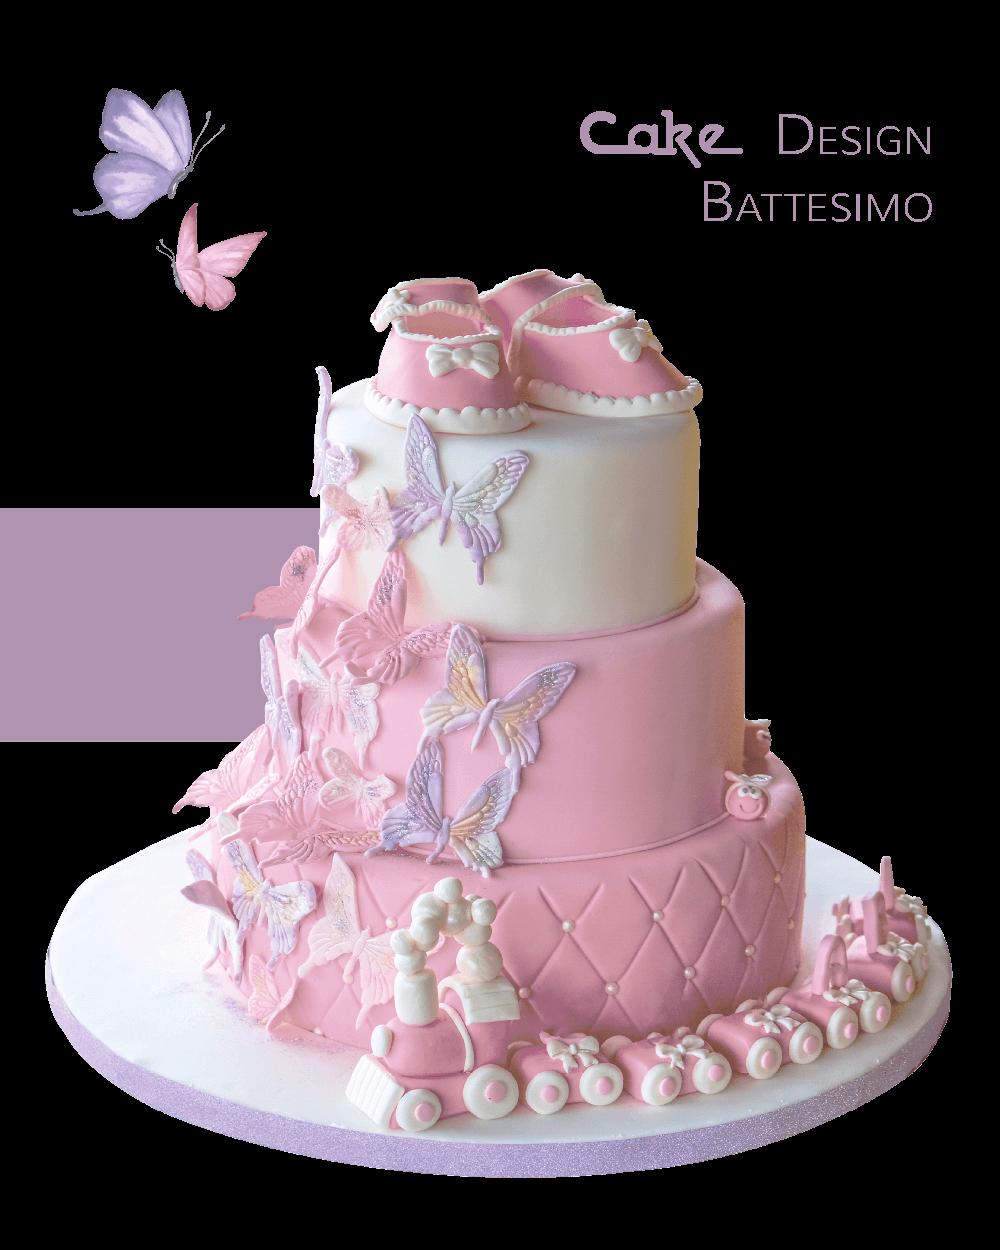 CAKE-DESIGN-BATTESIMO-responsive